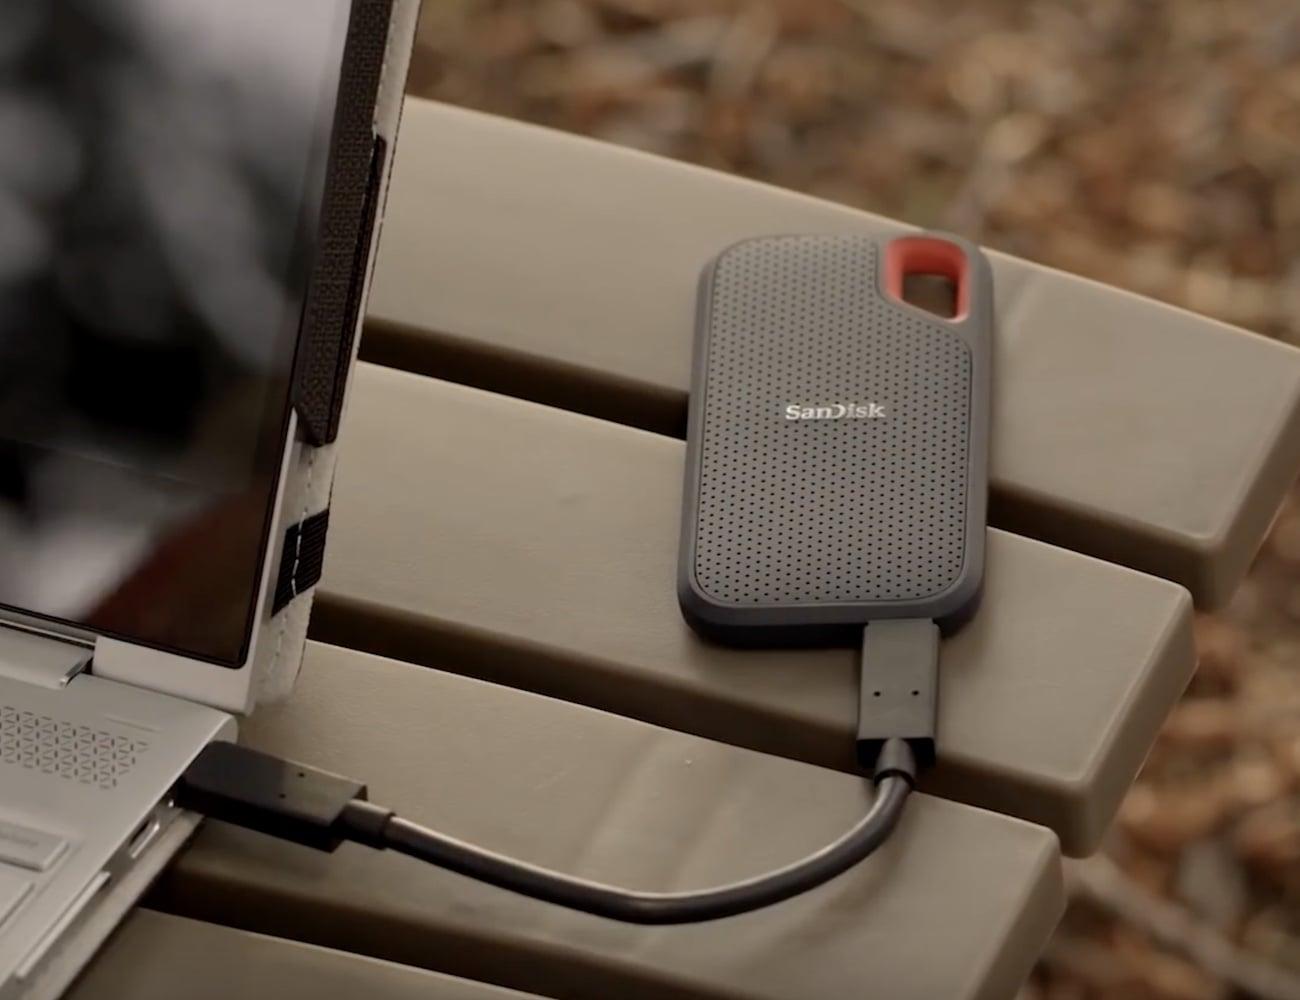 SSD SanDisk Extreme